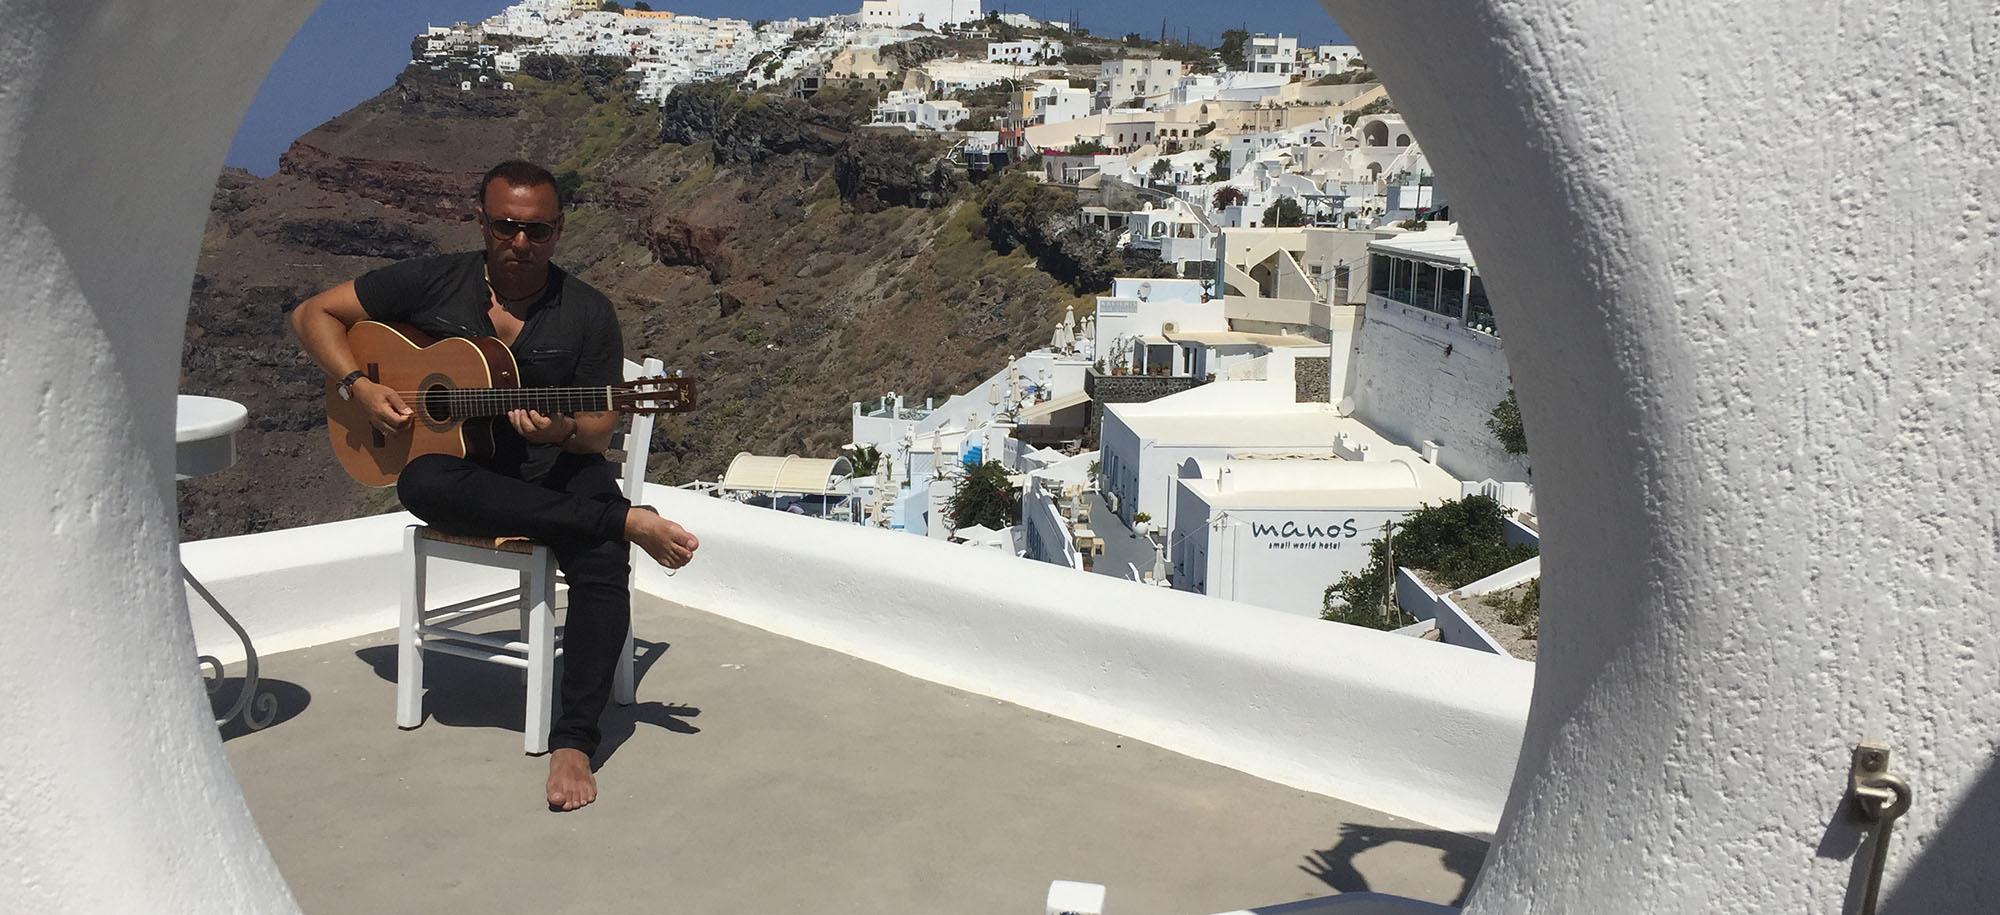 Pavlo: Behind the Scenes from Santorini